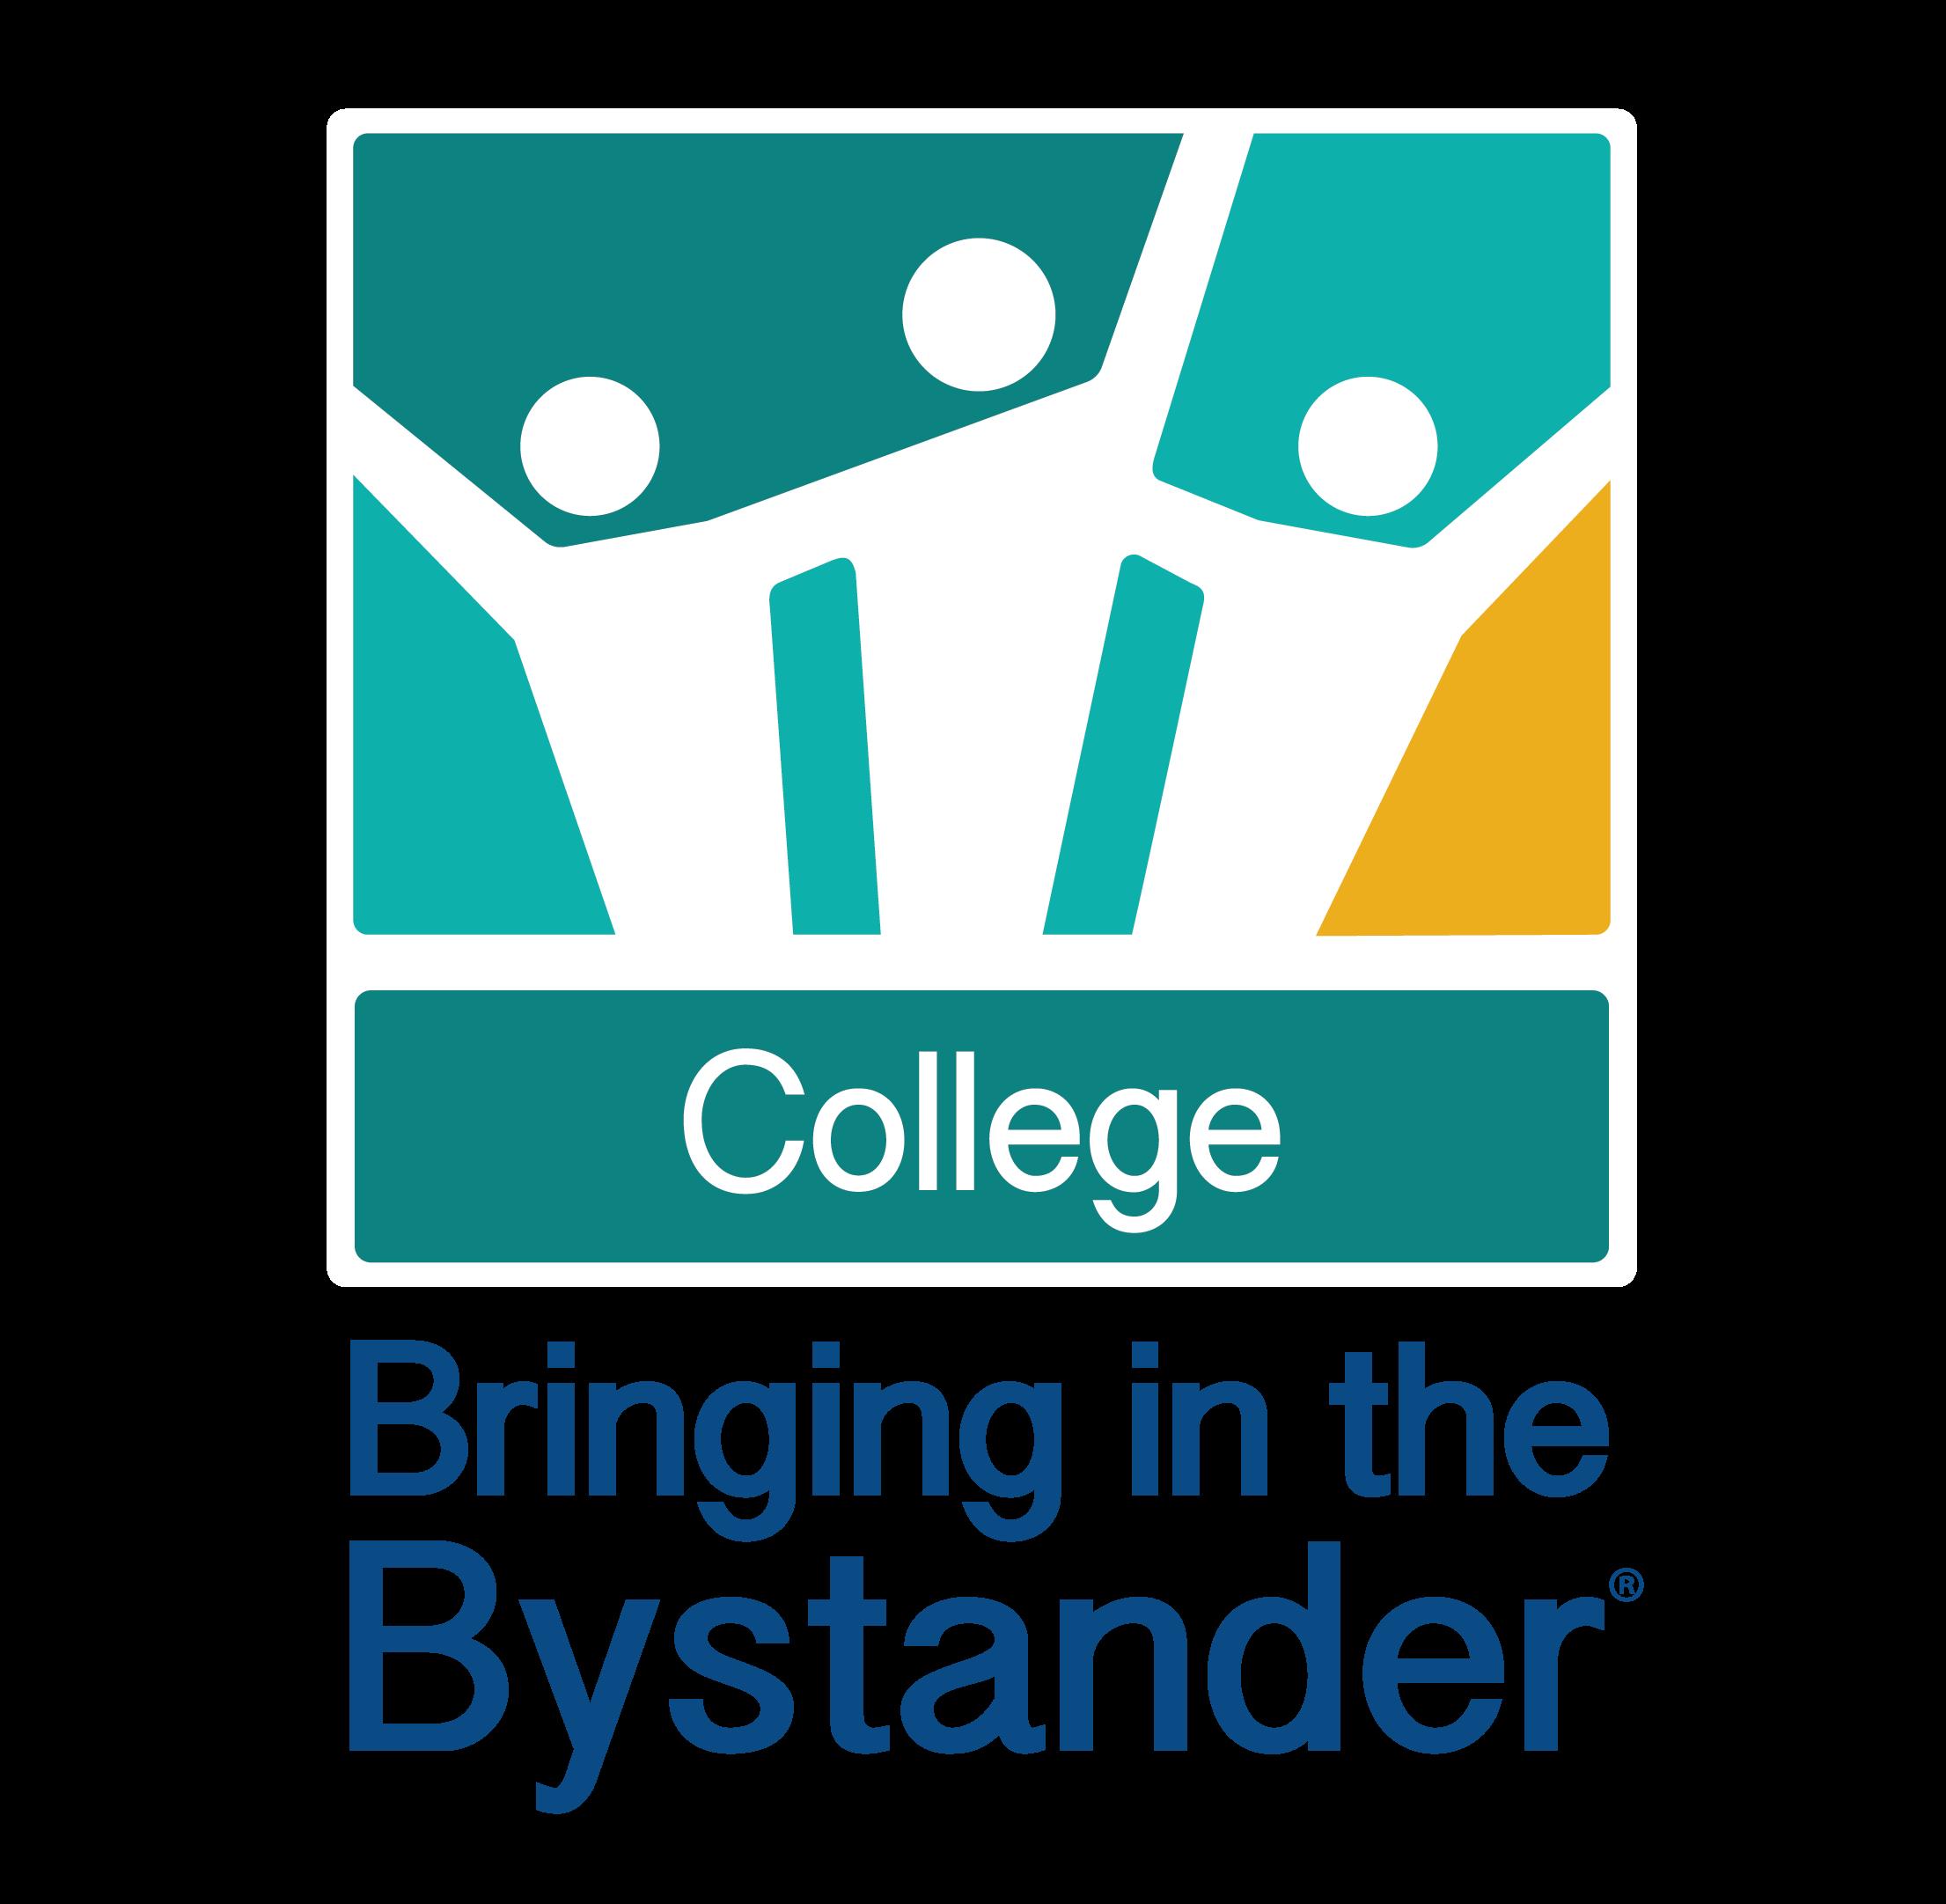 Image of Bringing in the Bystander®